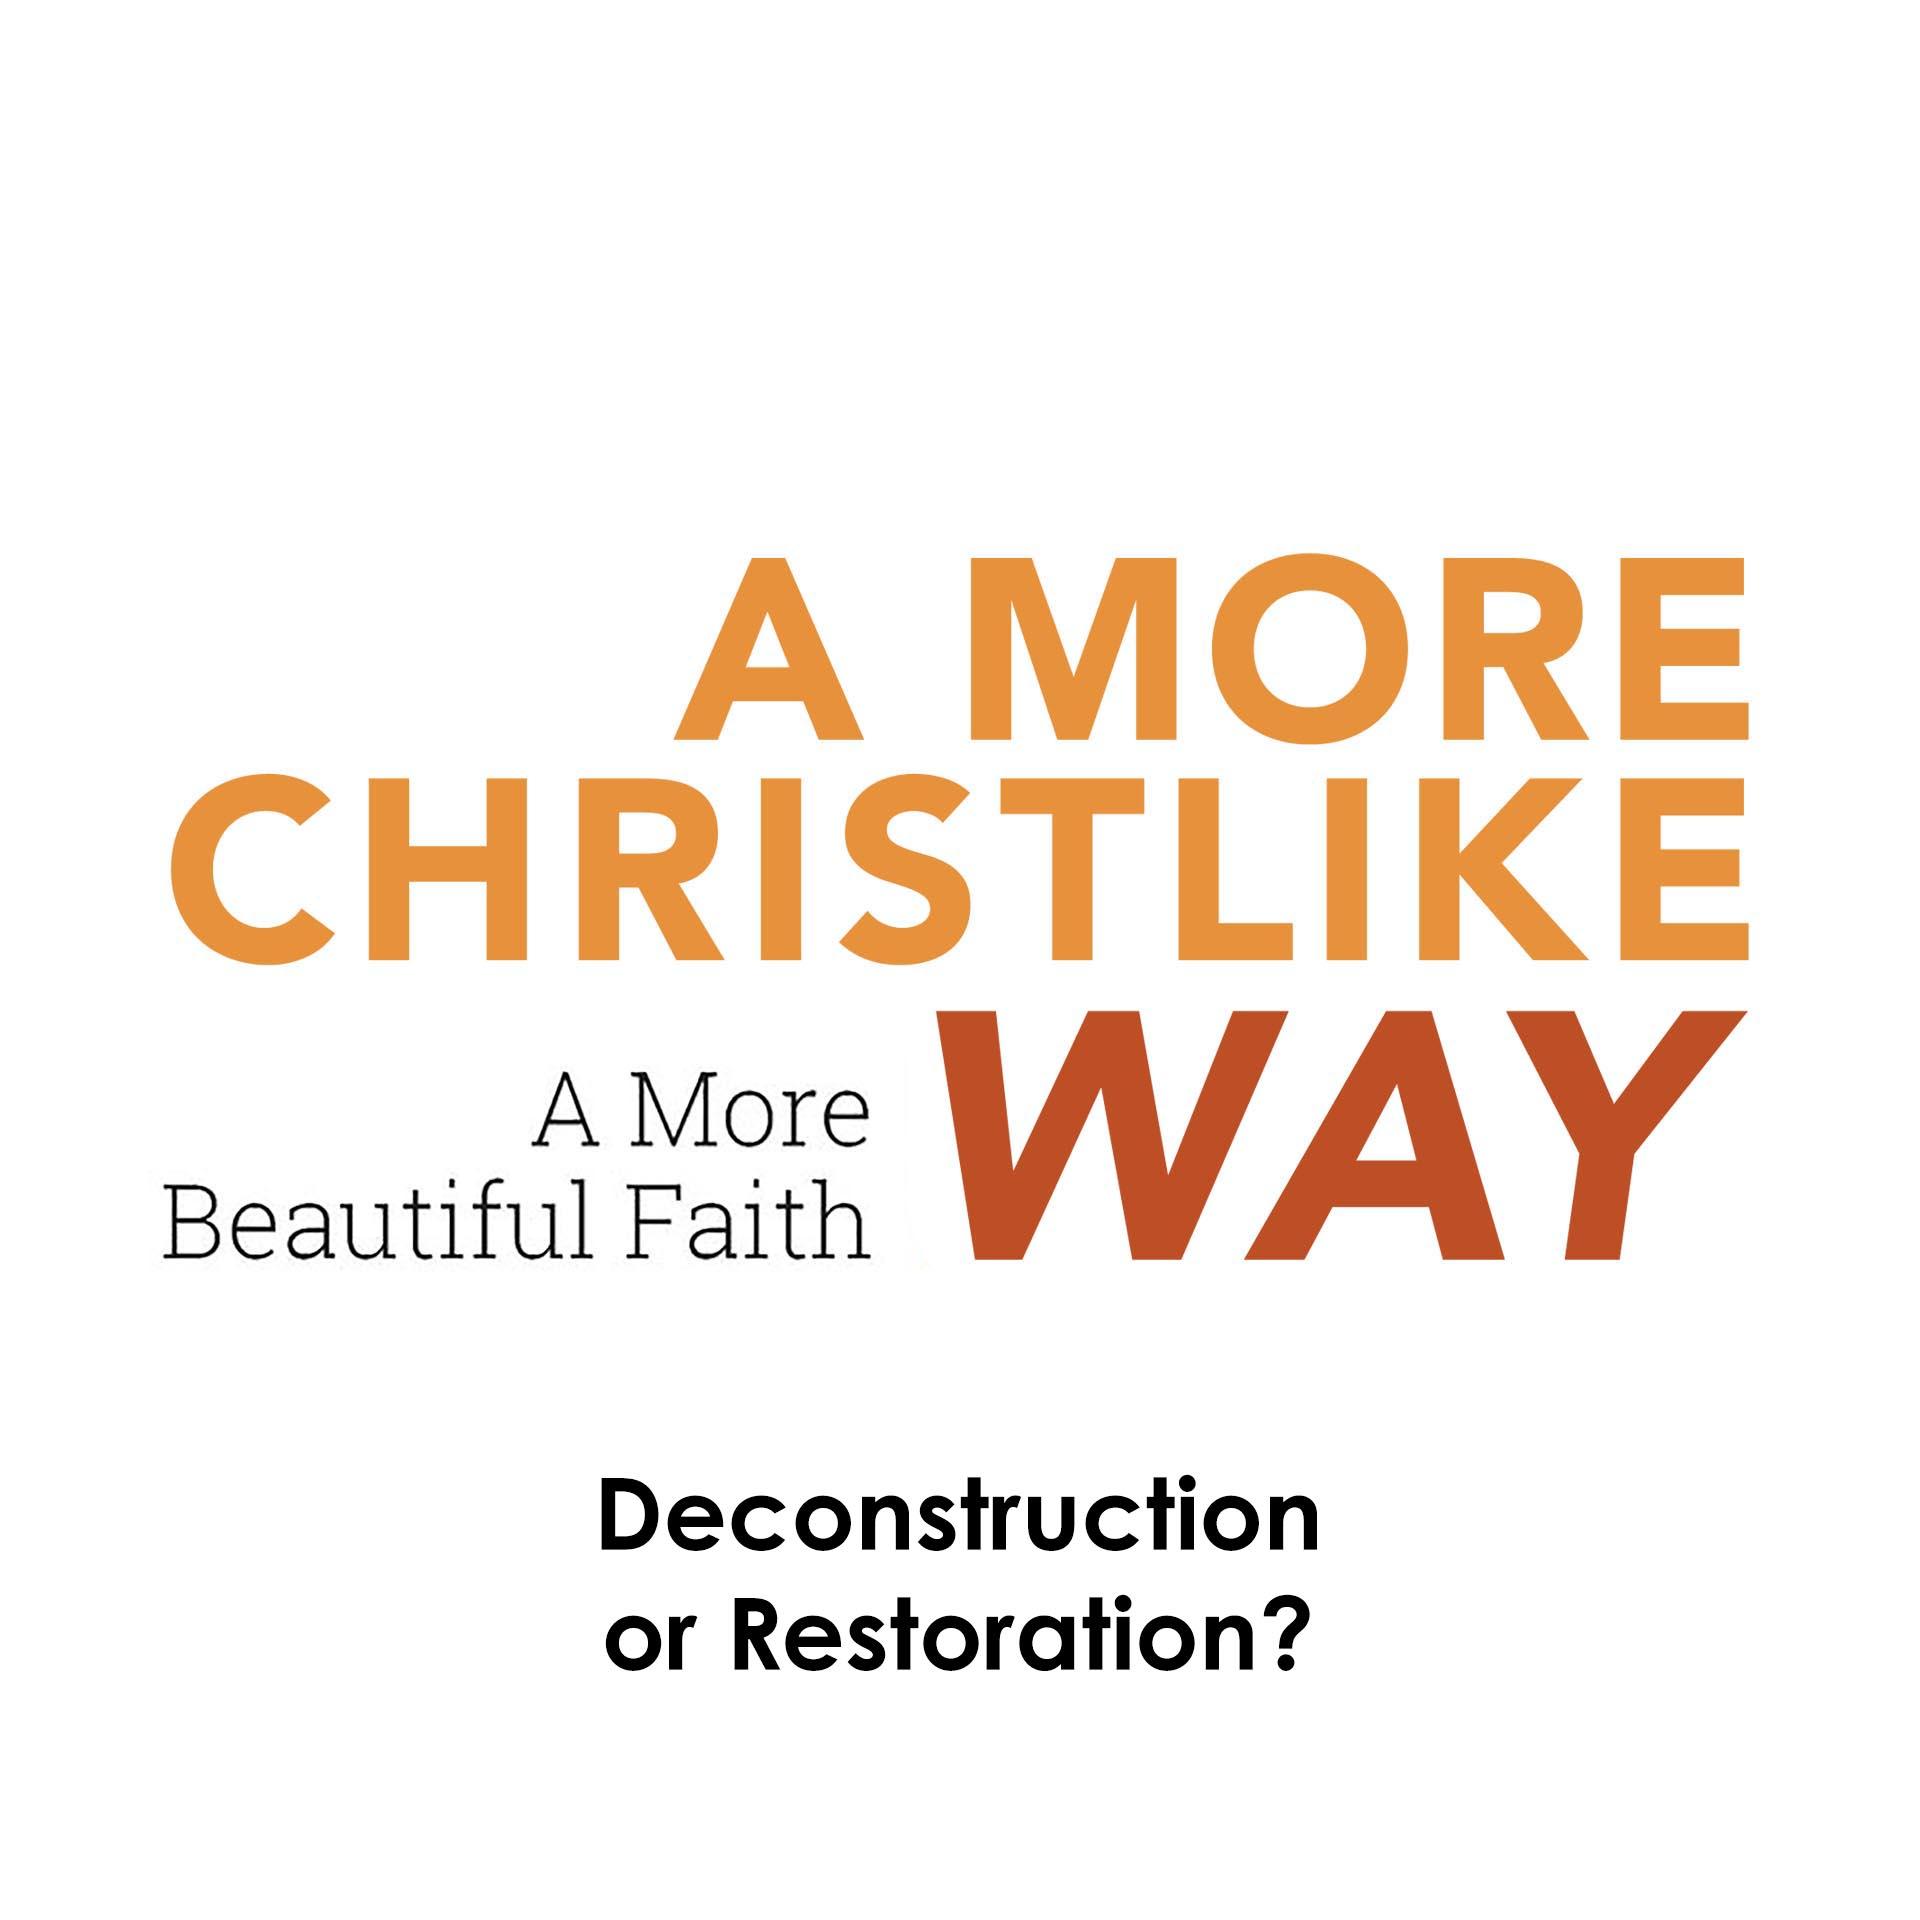 A More Christlike Way: Deconstruction or Restoration?